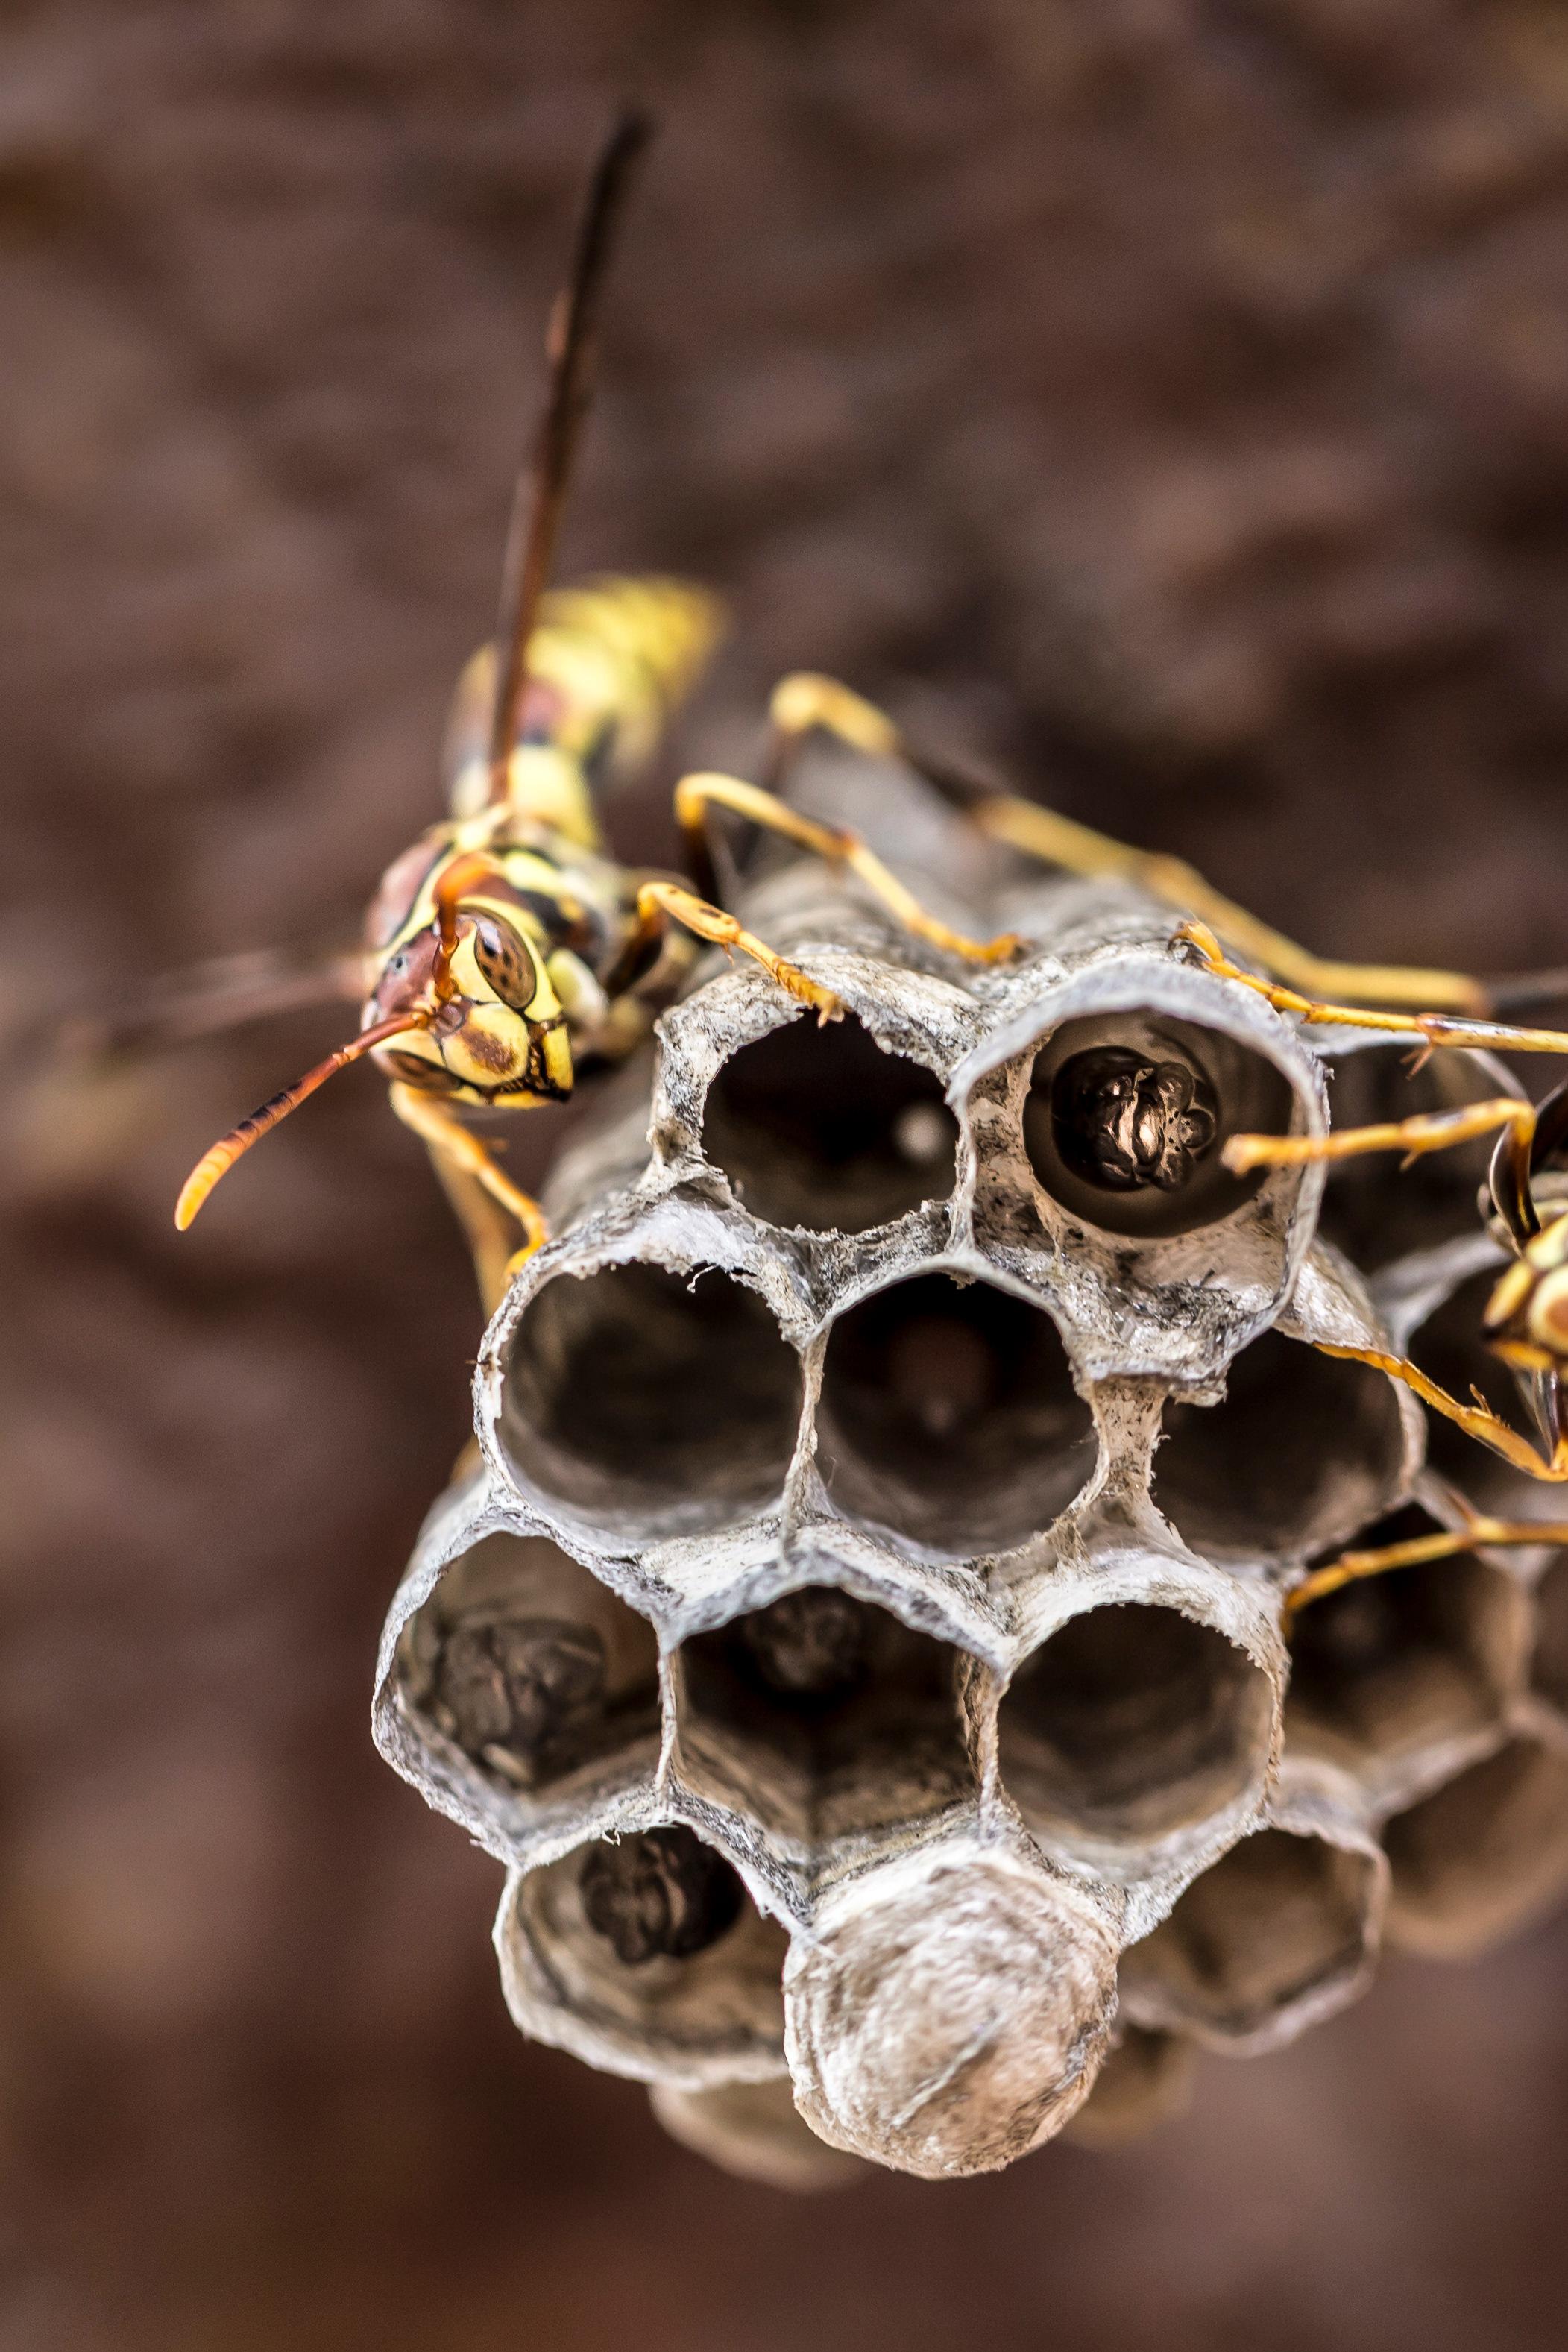 insect-wasp-larvae-willi-willi-tree-festival-Waikoloa-Village-Hawaii-Island-South-Kohala-340.jpg